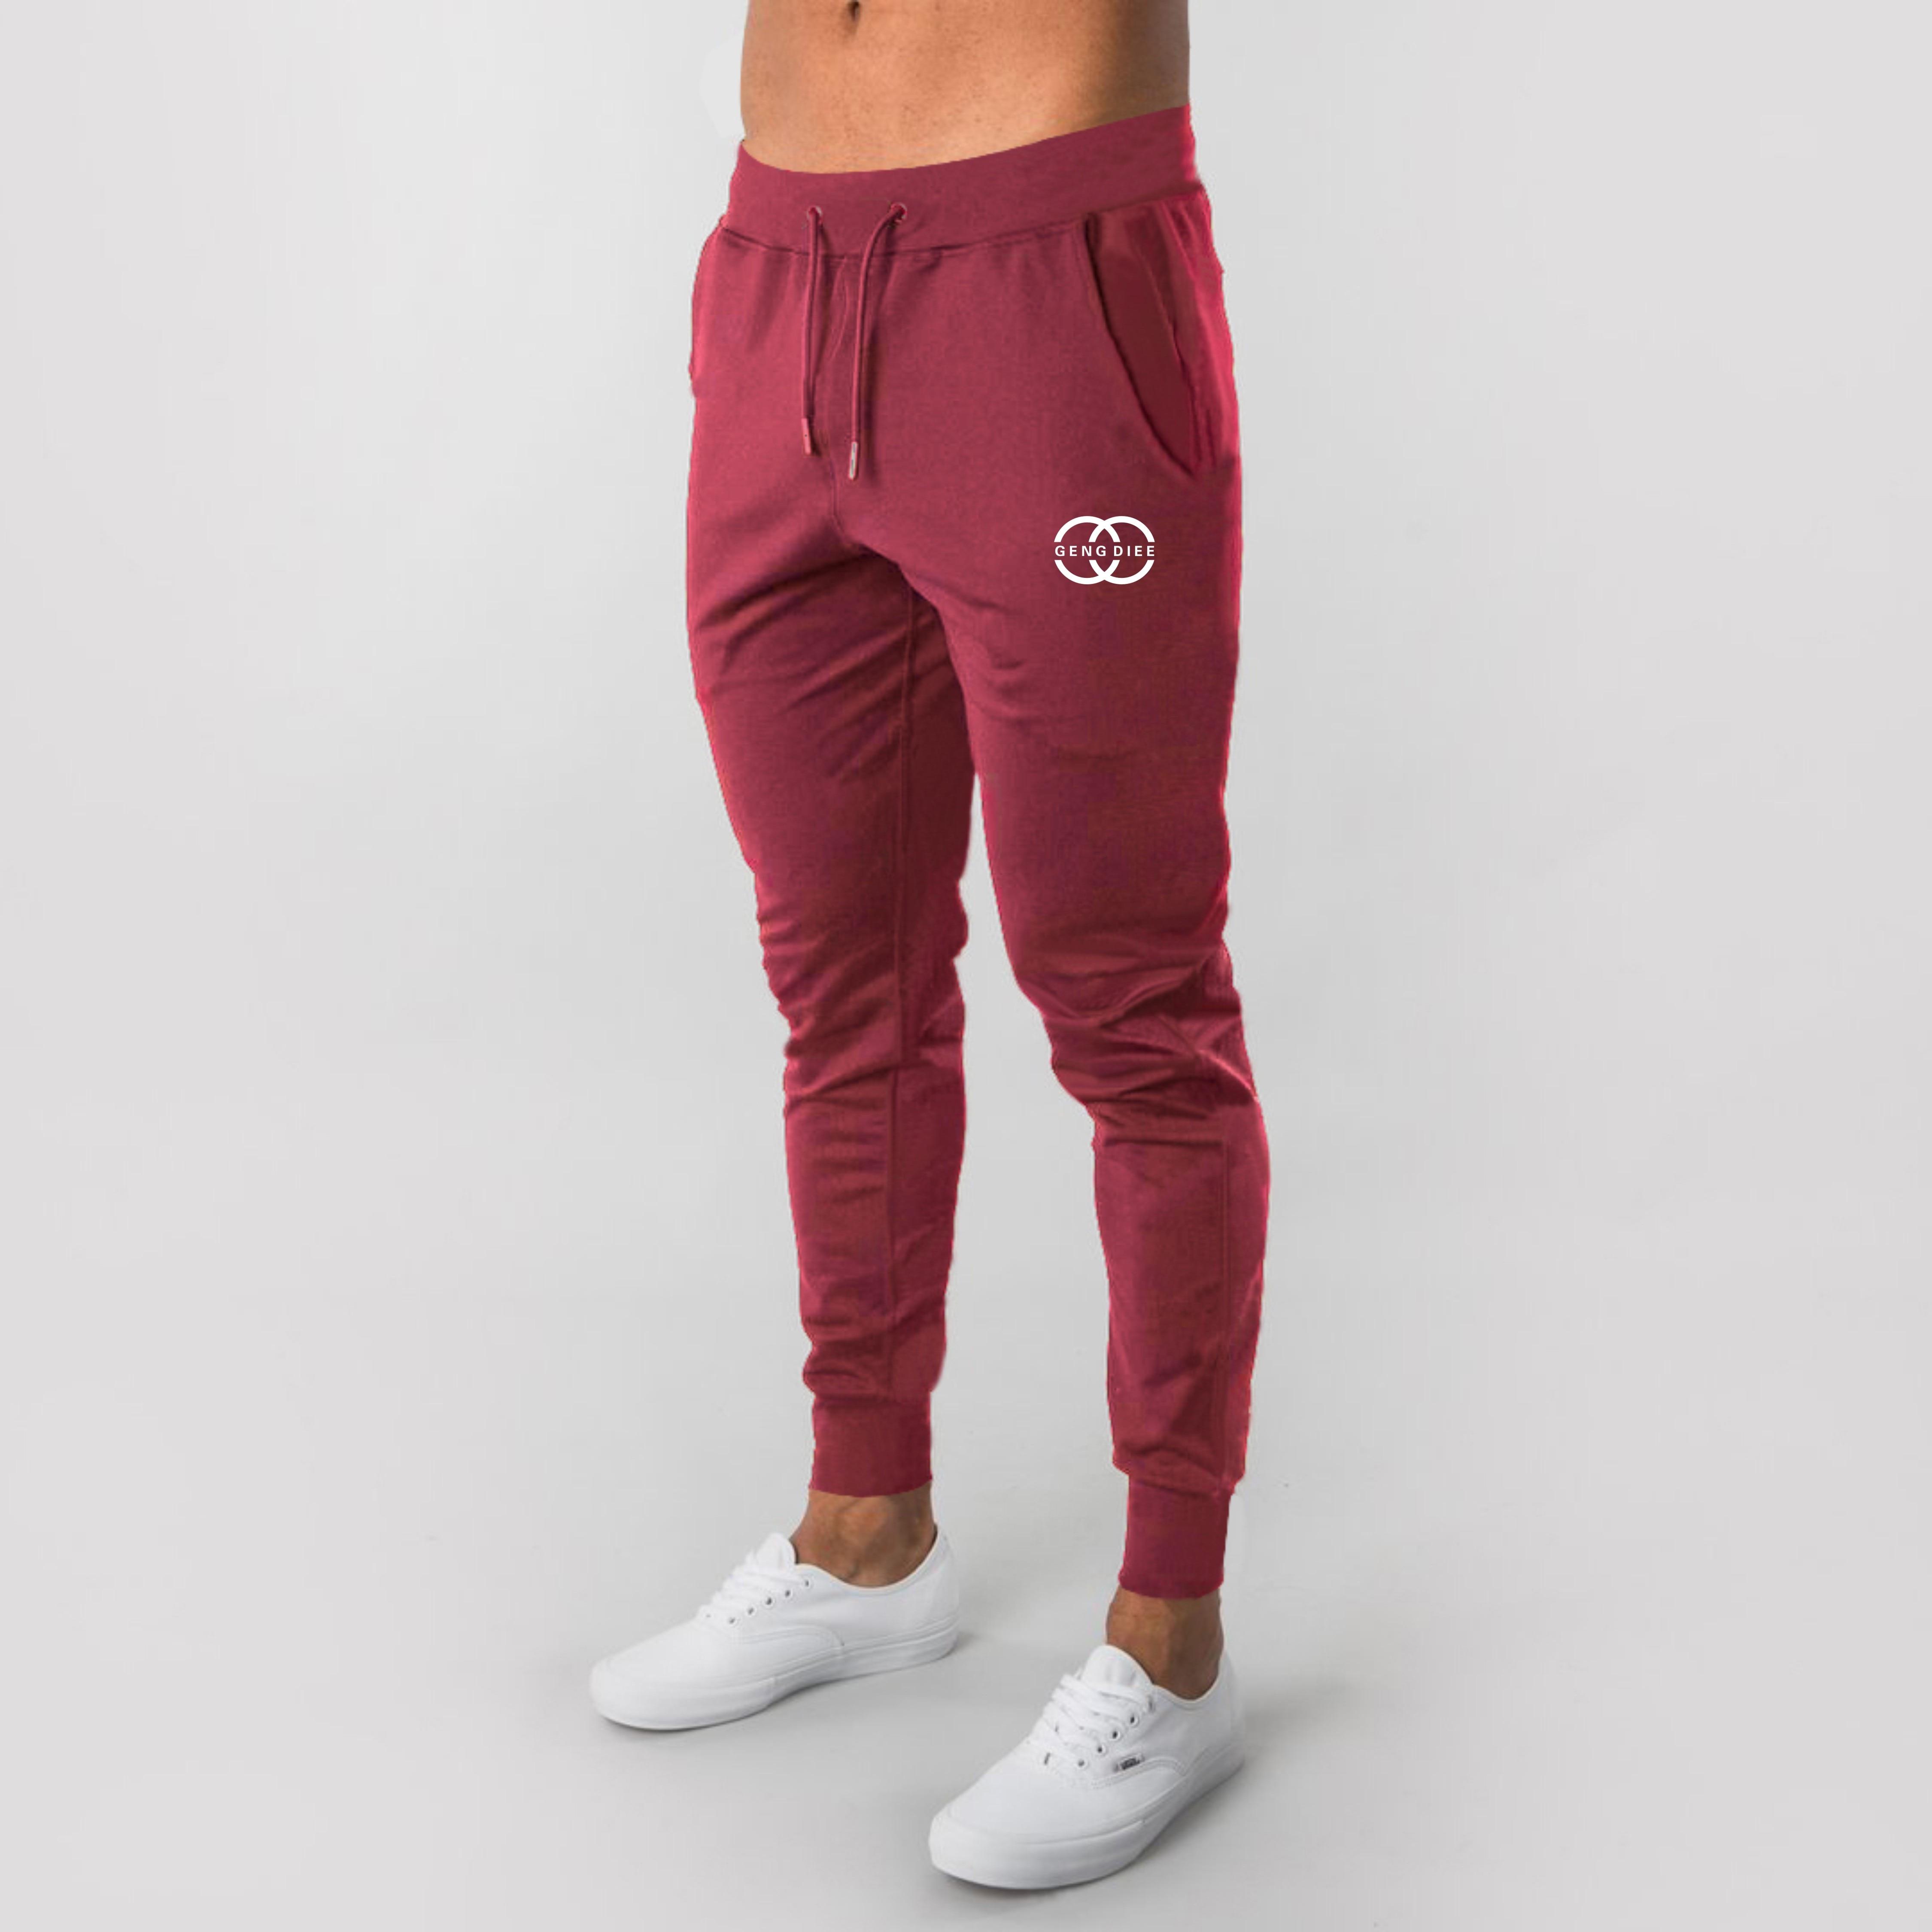 2020 New Fashion Long Trousers printing Sweatpants Men Joggers Multi-pocket Pants Autunm  Male Elastic Waist Men's Sportswear